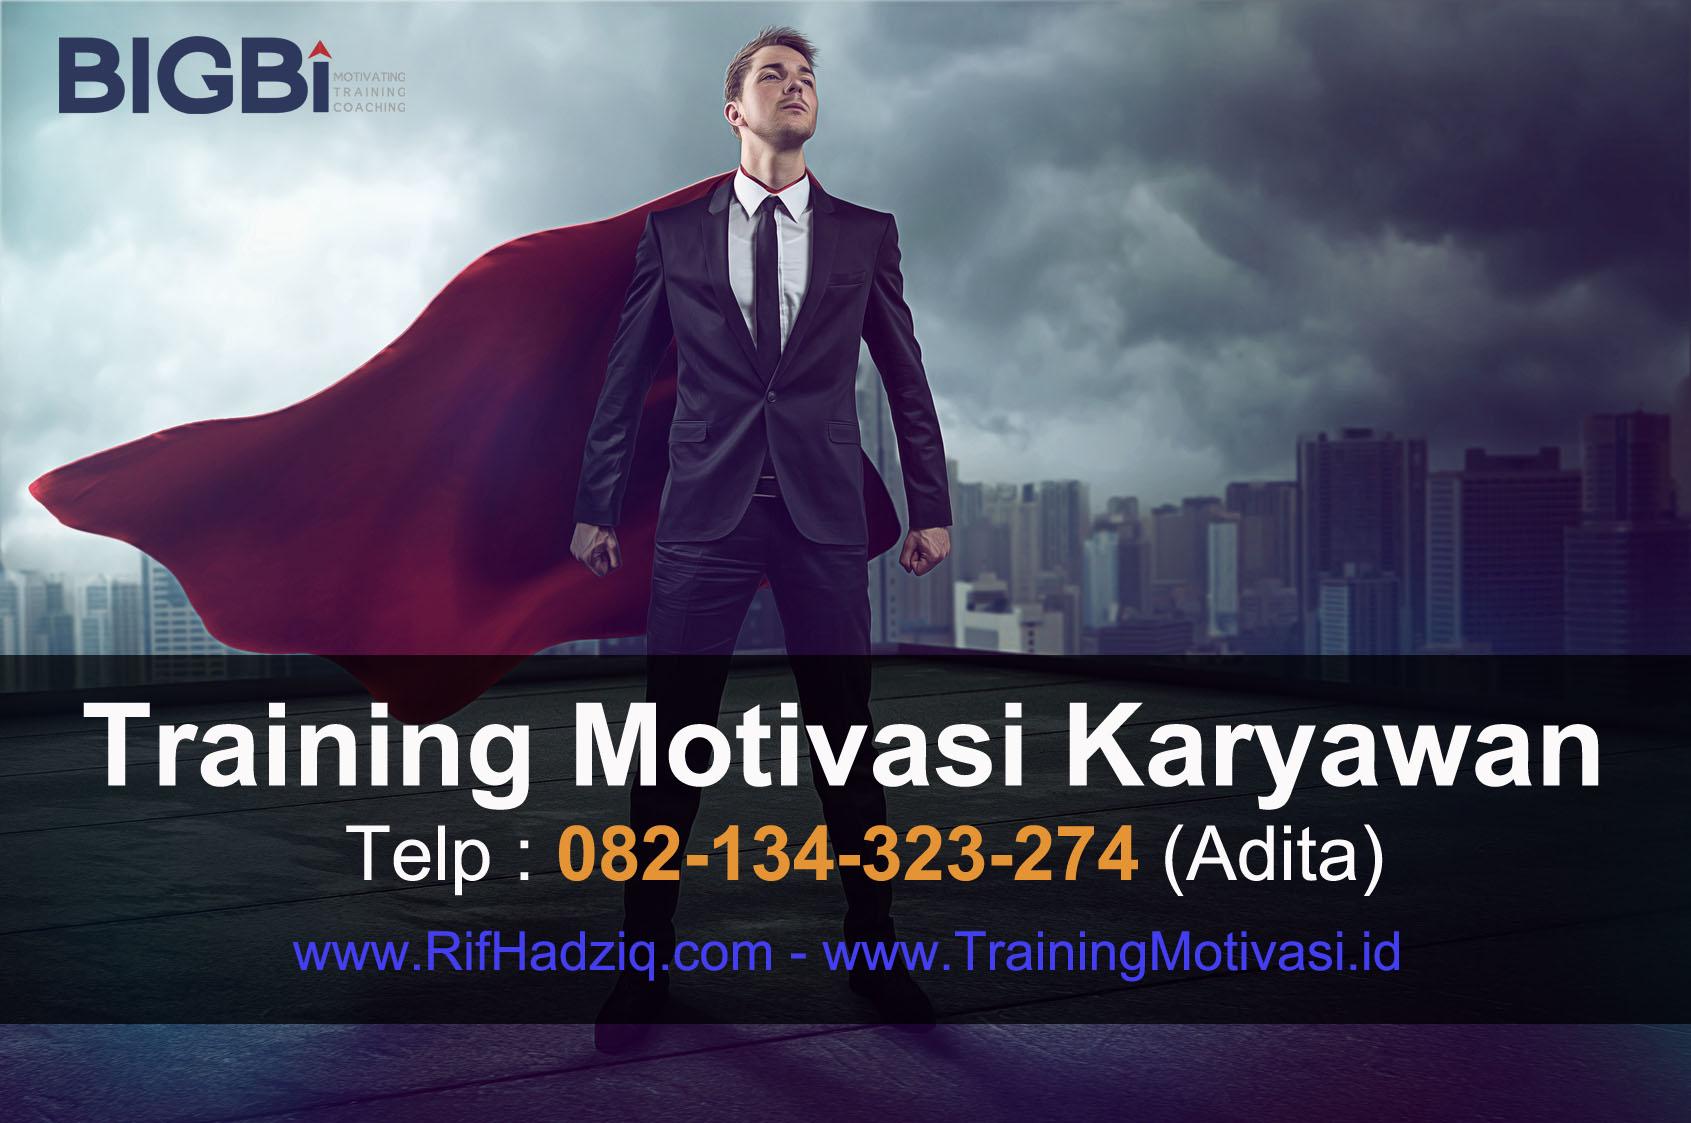 motivator indonesia, rif hadziq, james gwee, motivator perusahaan